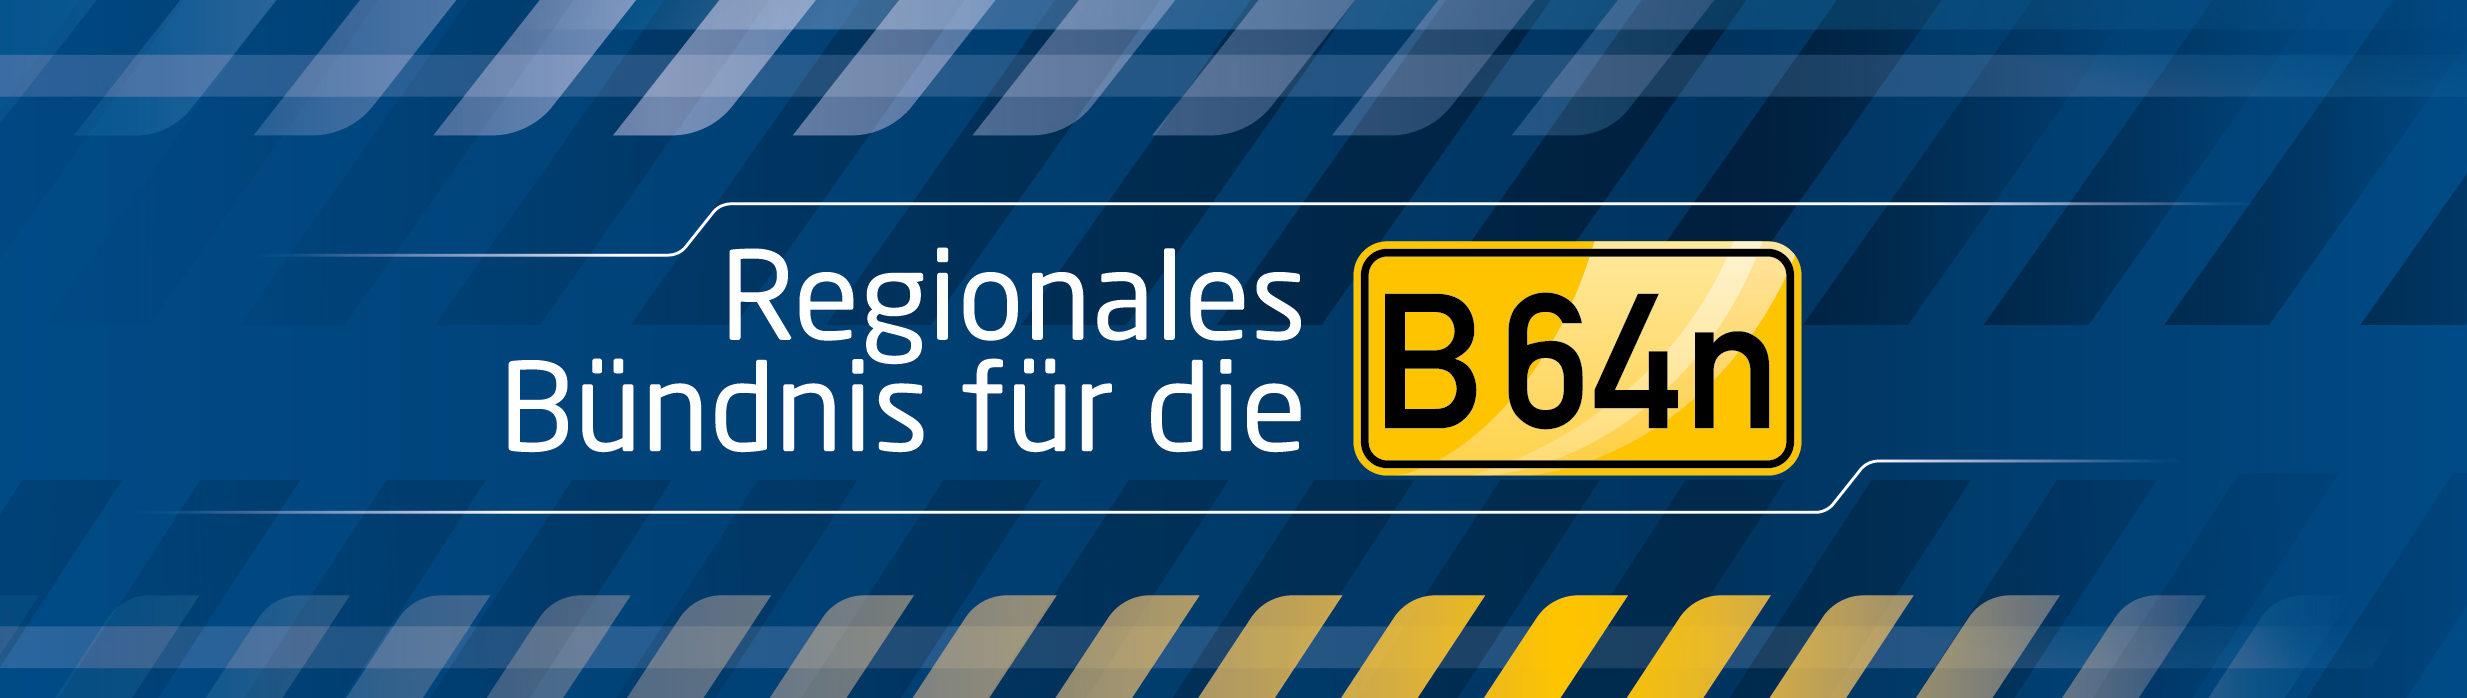 Bündnis für die B 64n